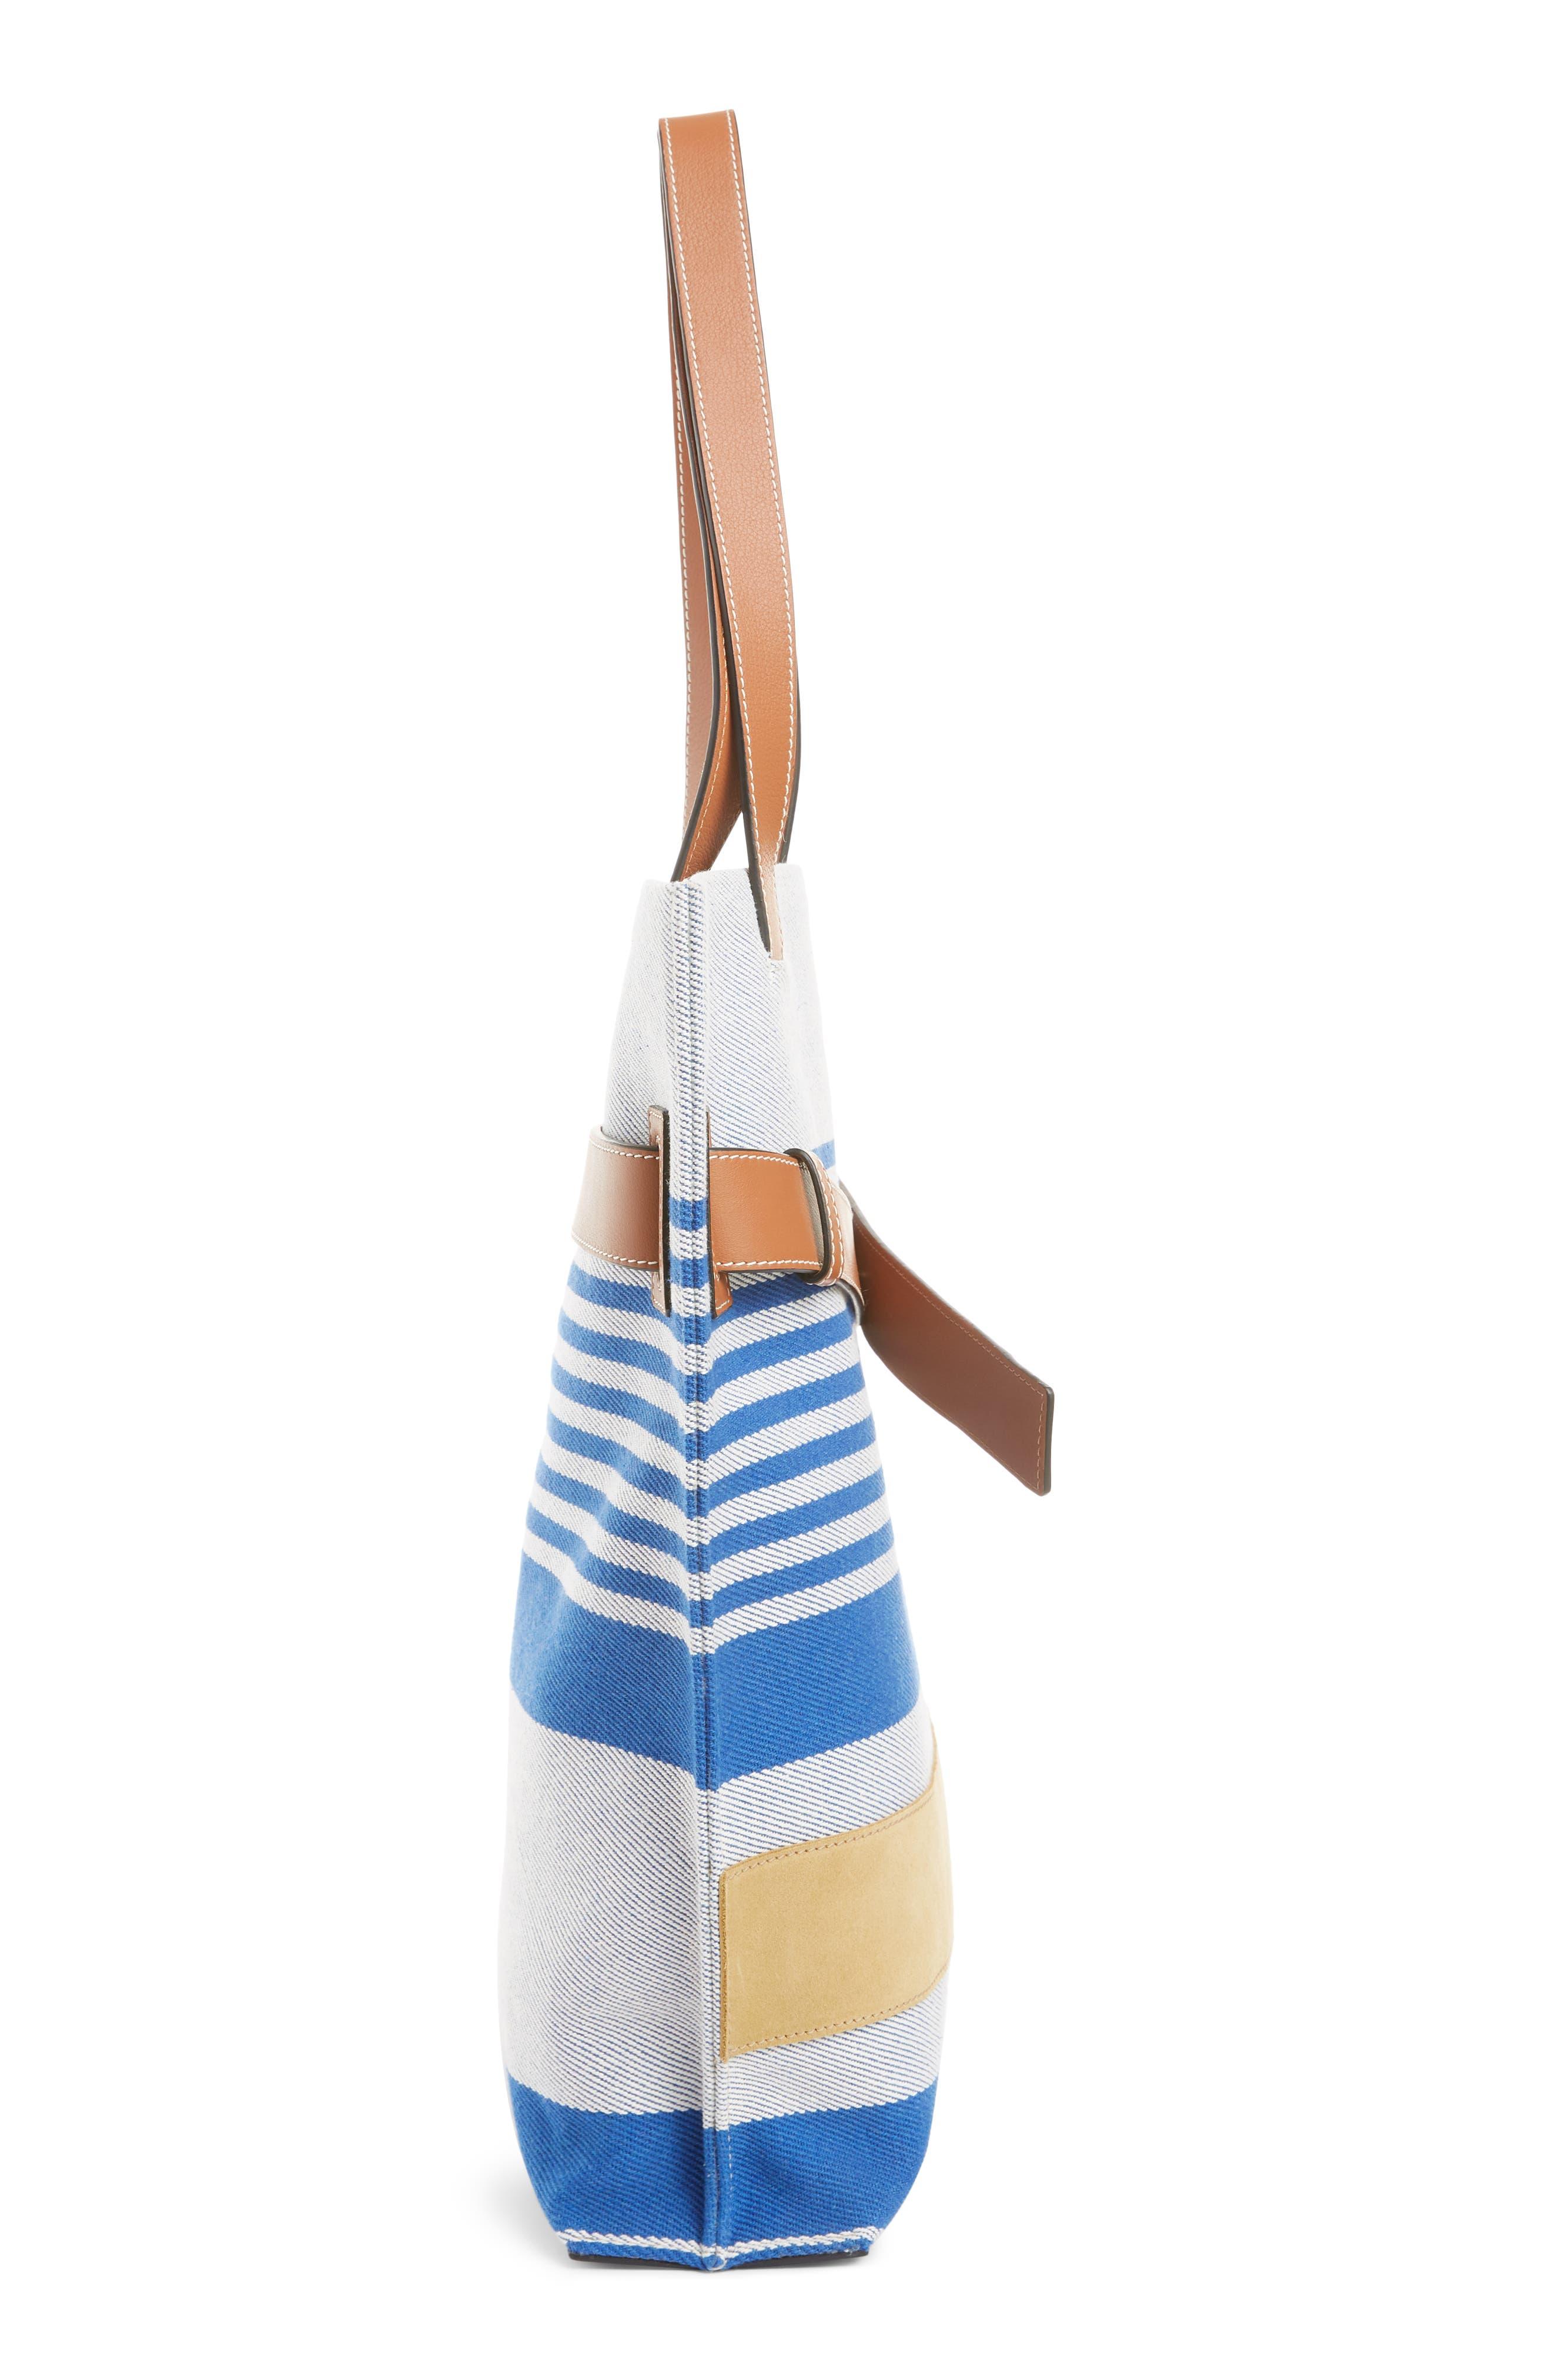 LOEWE, Stripe Twill Tote Bag, Alternate thumbnail 4, color, PACIFIC BLUE/MULTICOLOR